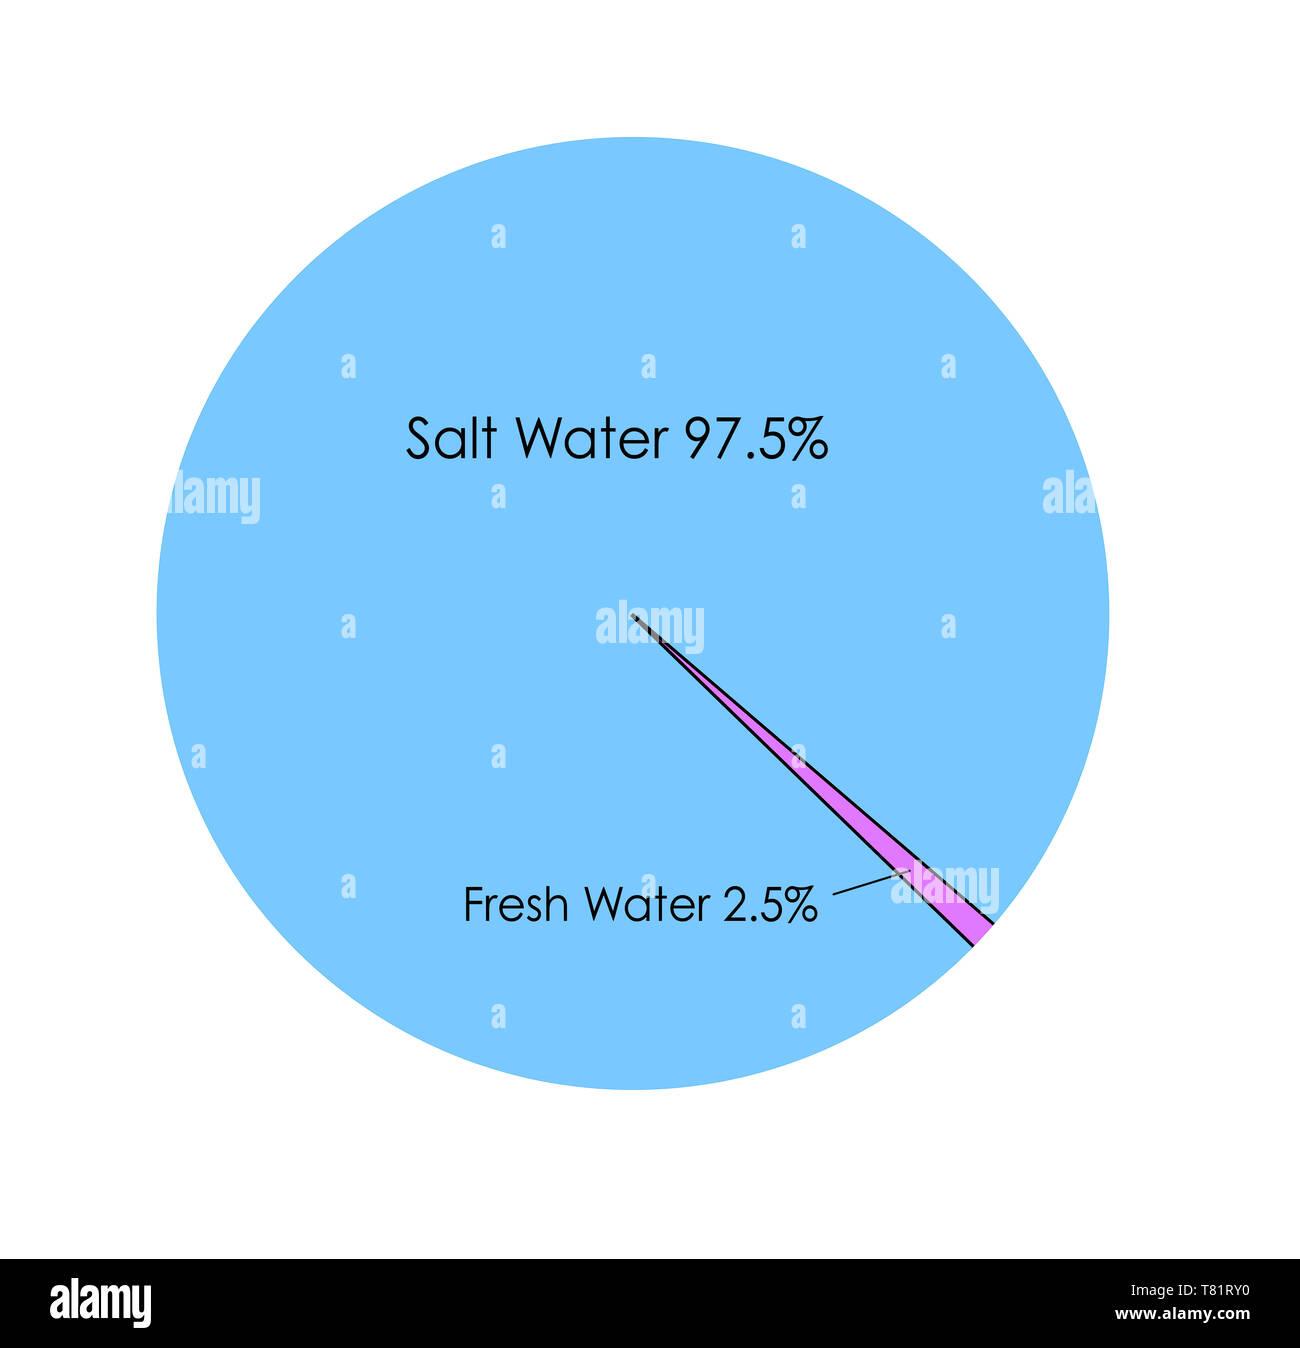 Salt Water Vs Fresh Water Infographic Stock Photo Alamy